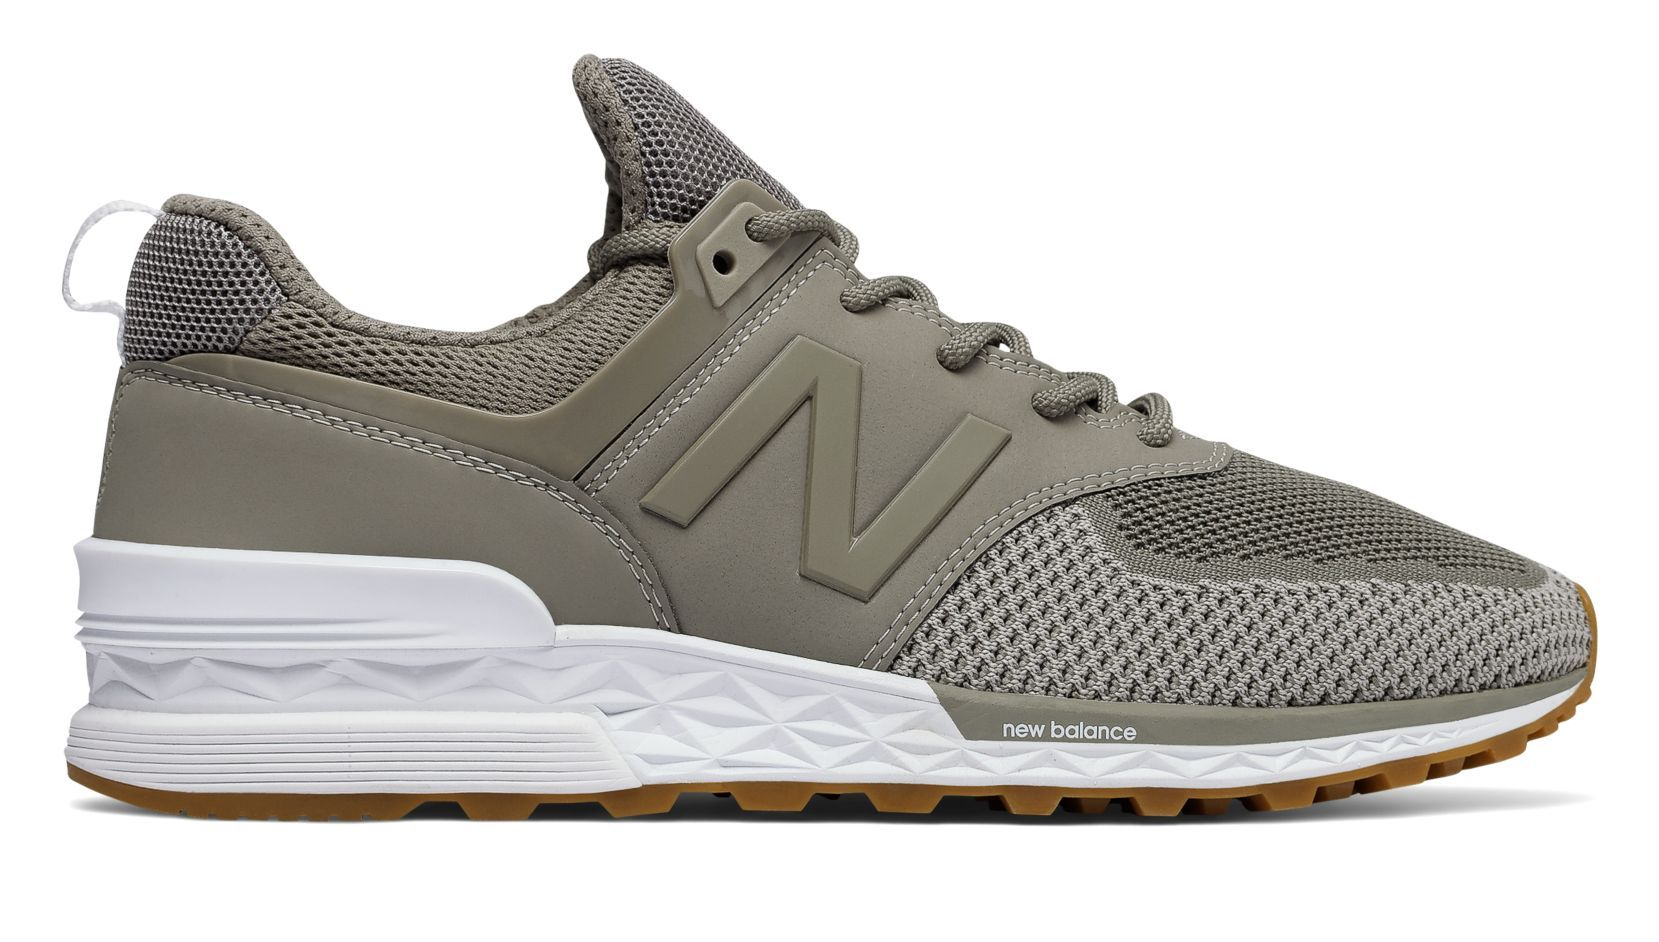 new balance 574 military urban grey